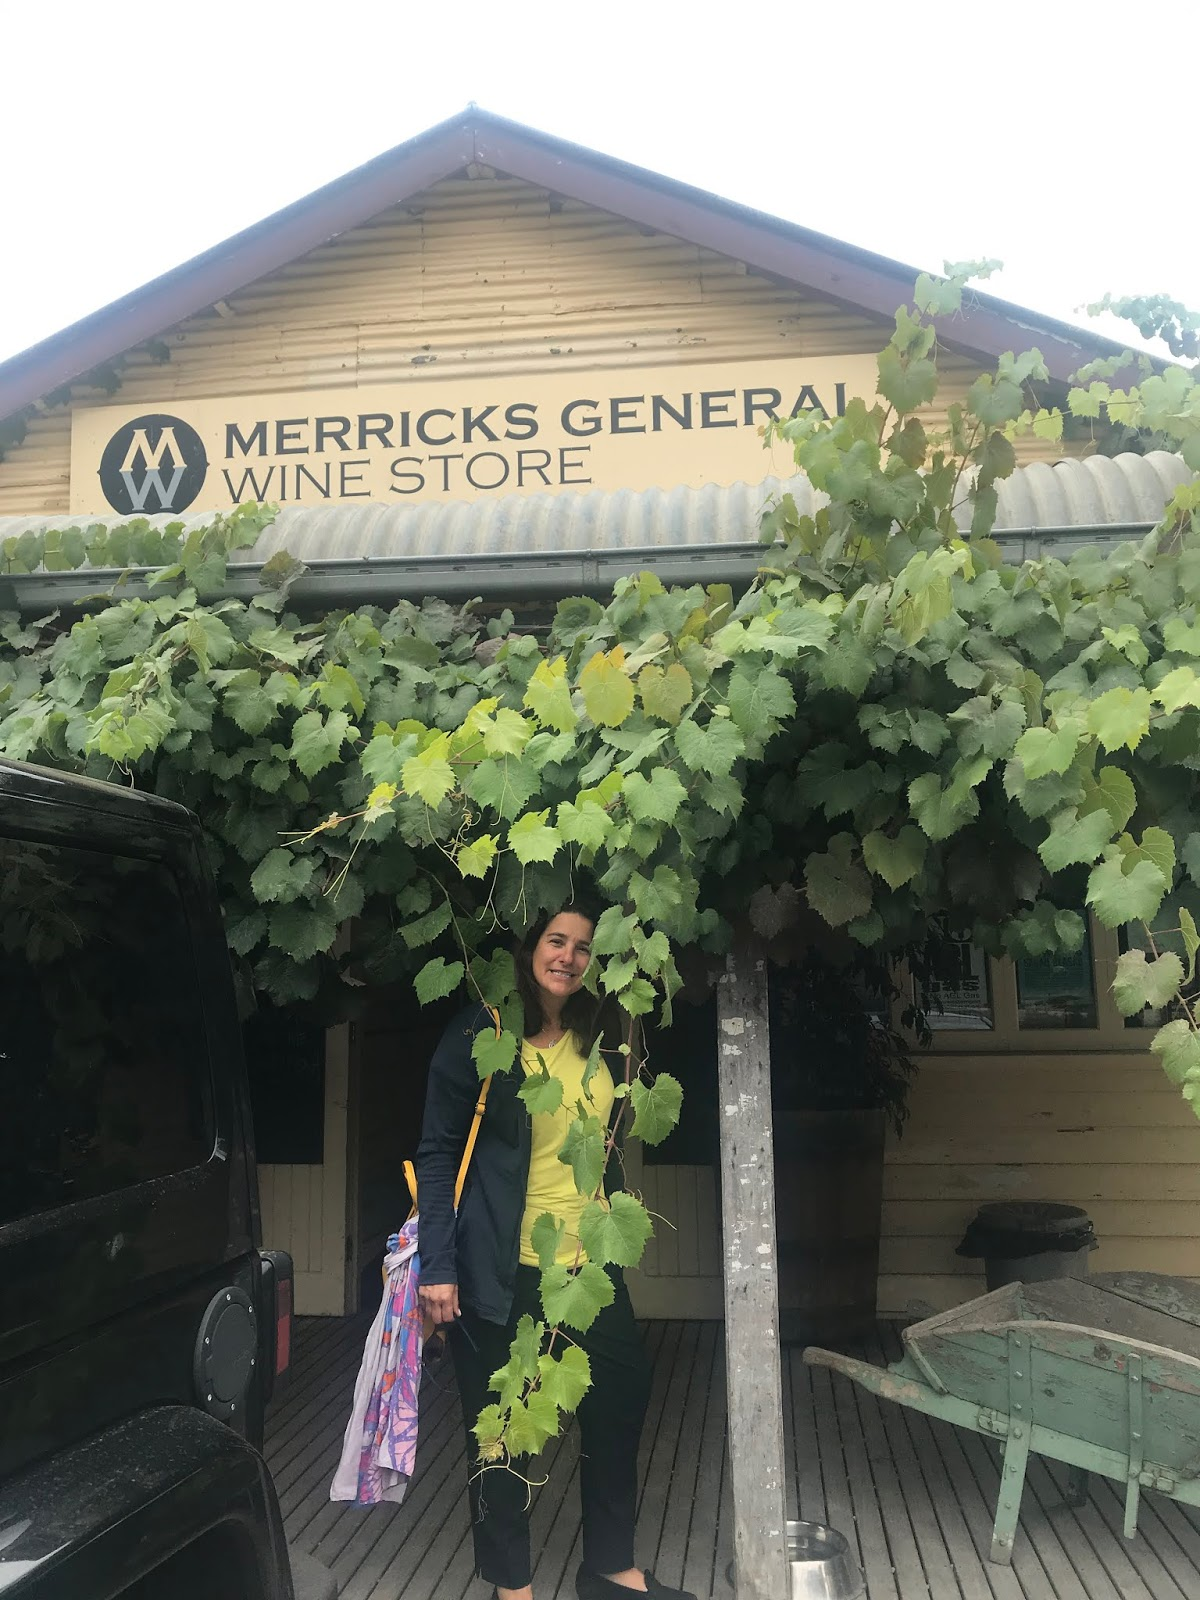 Merrick's General Wine Store, Melbourne